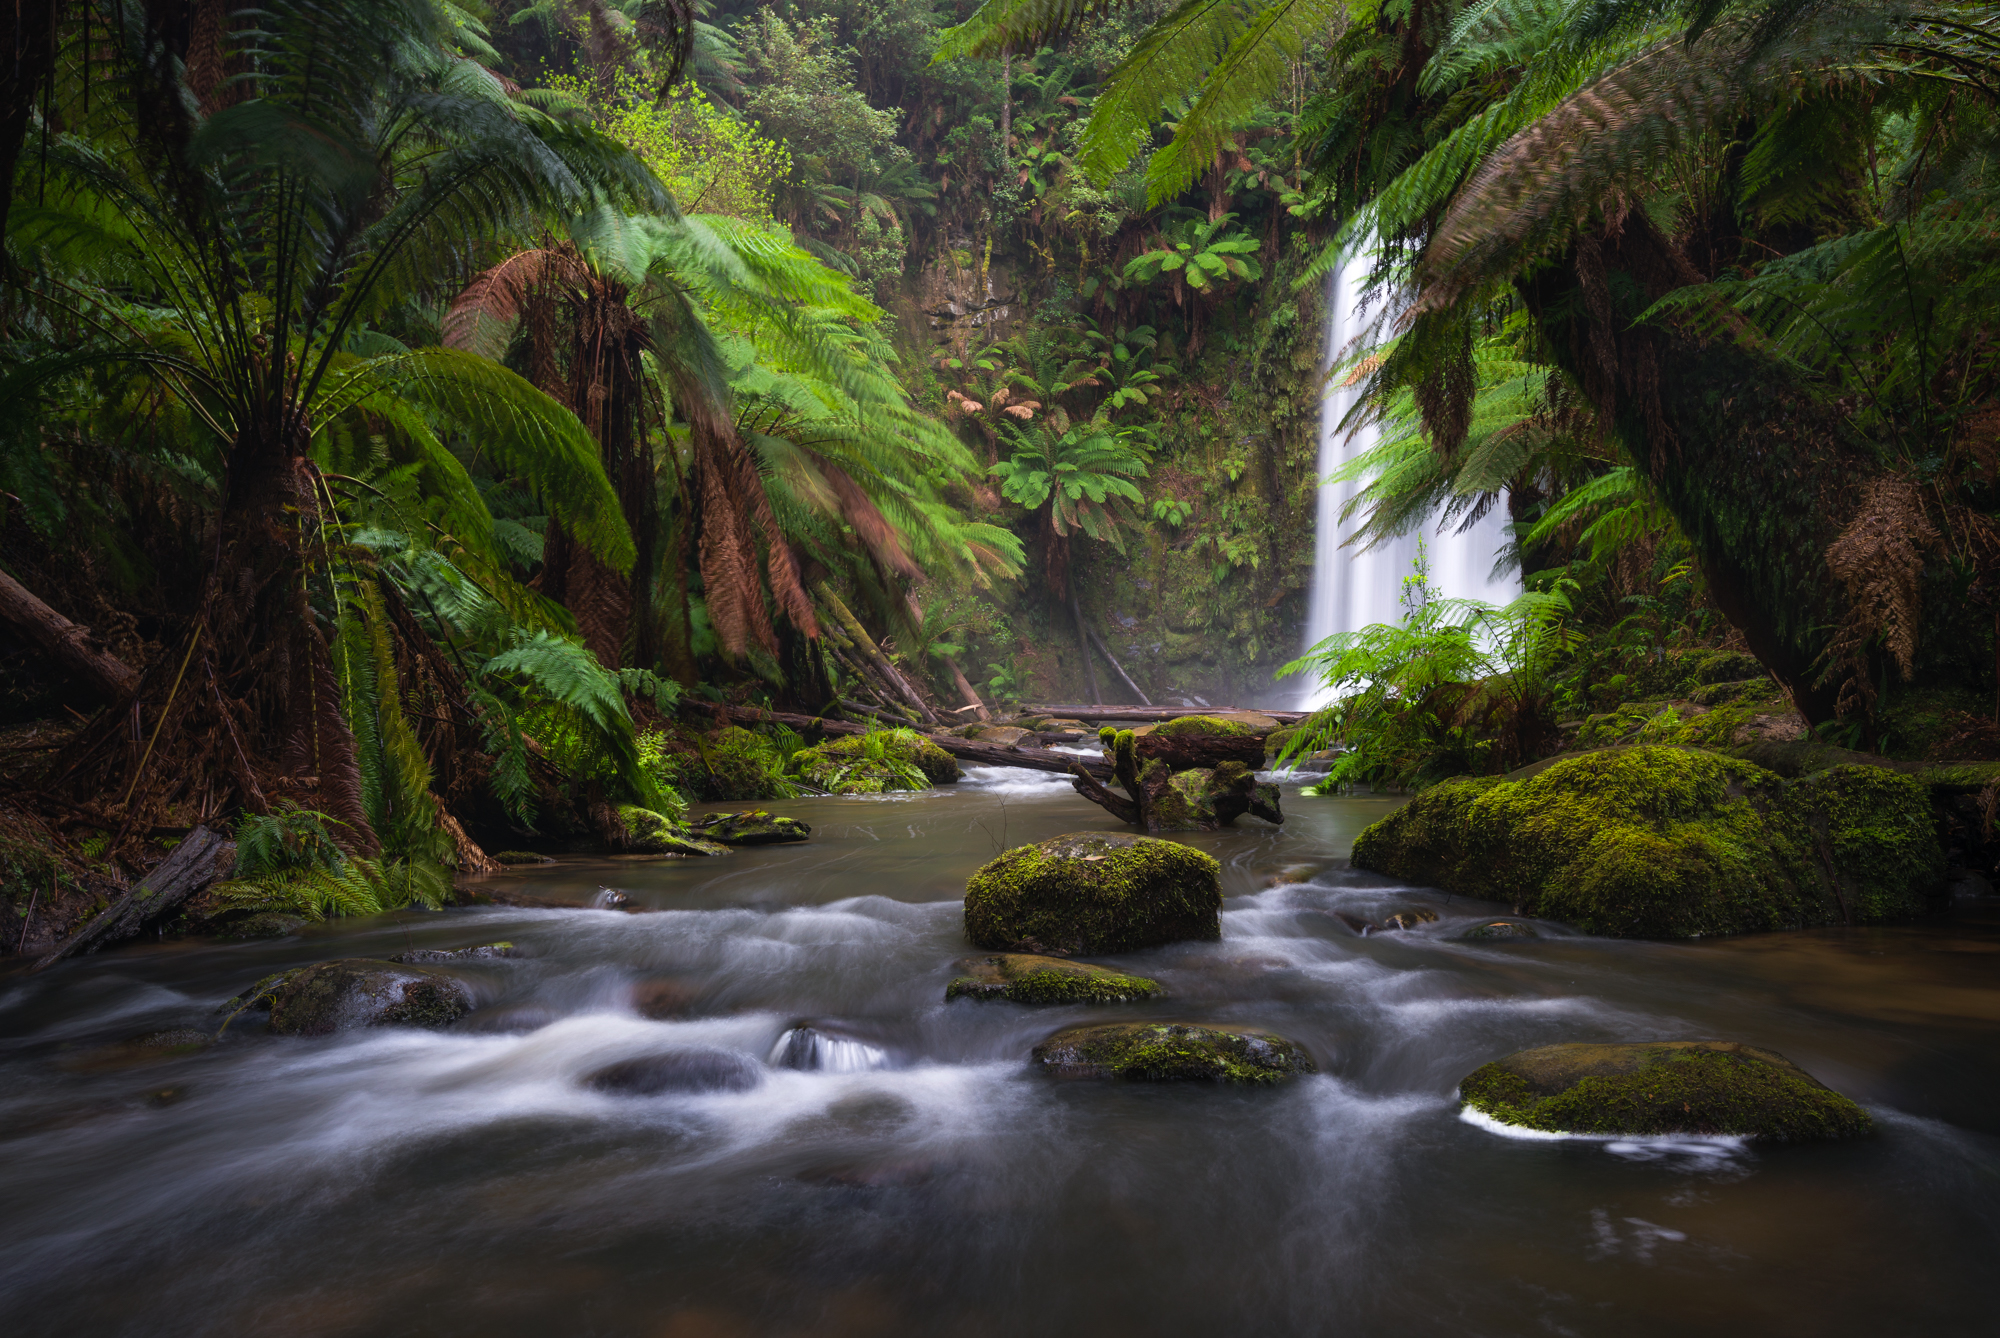 Beauchamp Falls - Nikon D800 @ ISO 100 | f/8 | 30mm | 1/4 sec